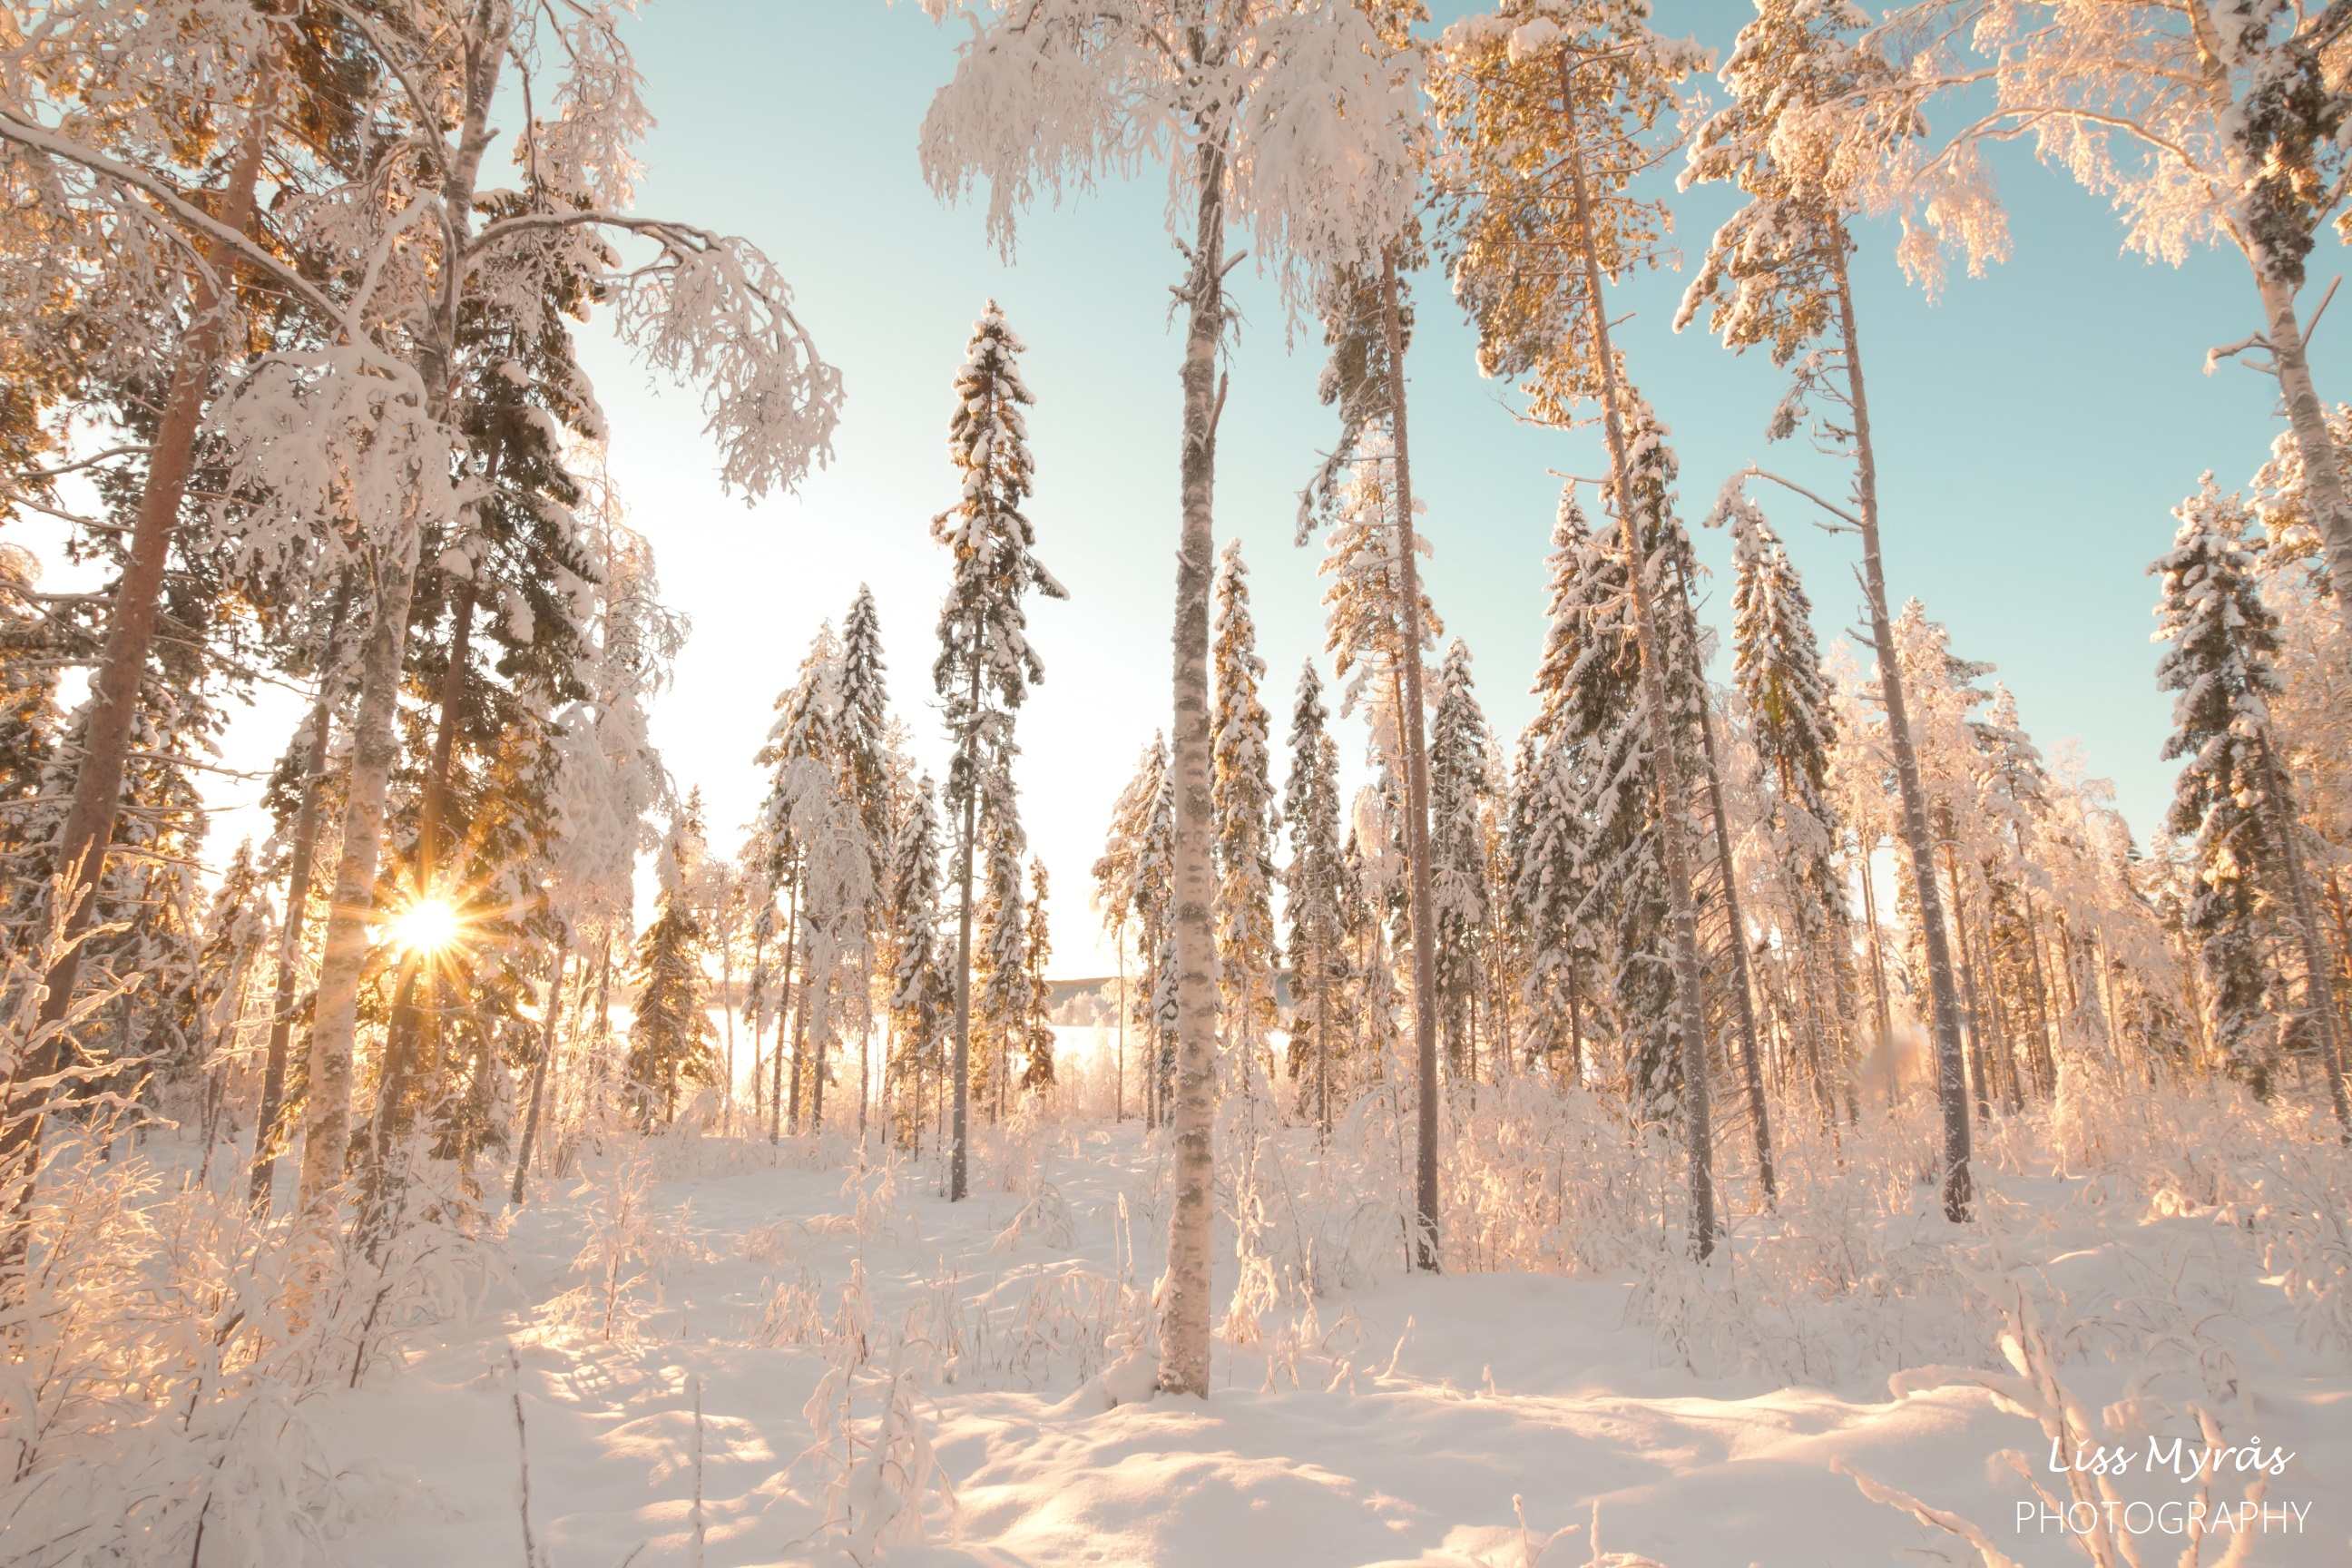 vinter landskap fores winter landscape skiing scandinavia nature outdoors